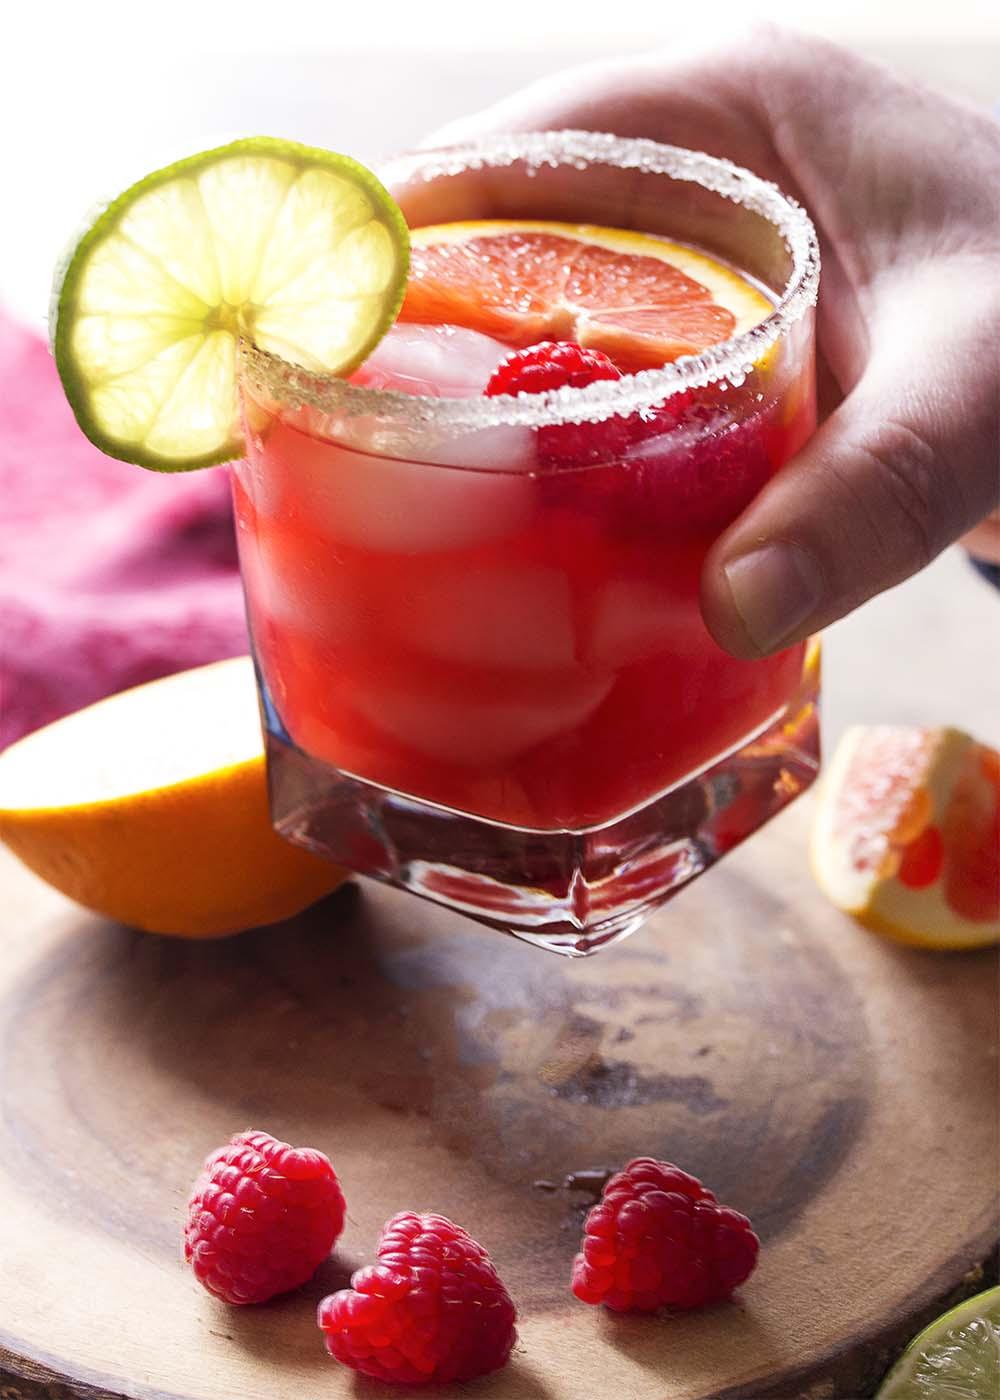 Hand lifting a glass of deep pink margarita.